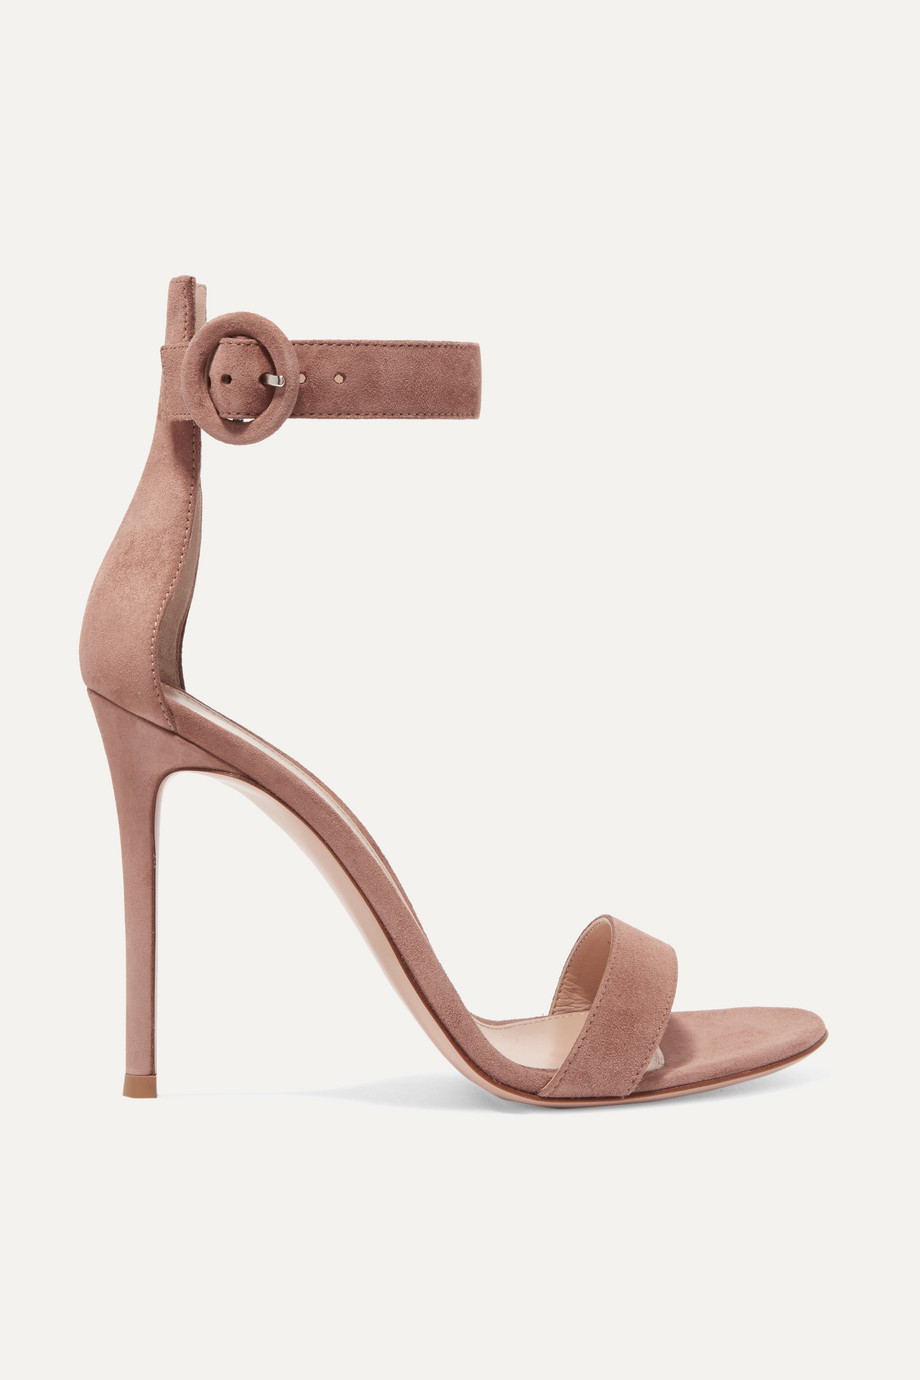 Gianvito Rossi Portofino 105 绒面革凉鞋